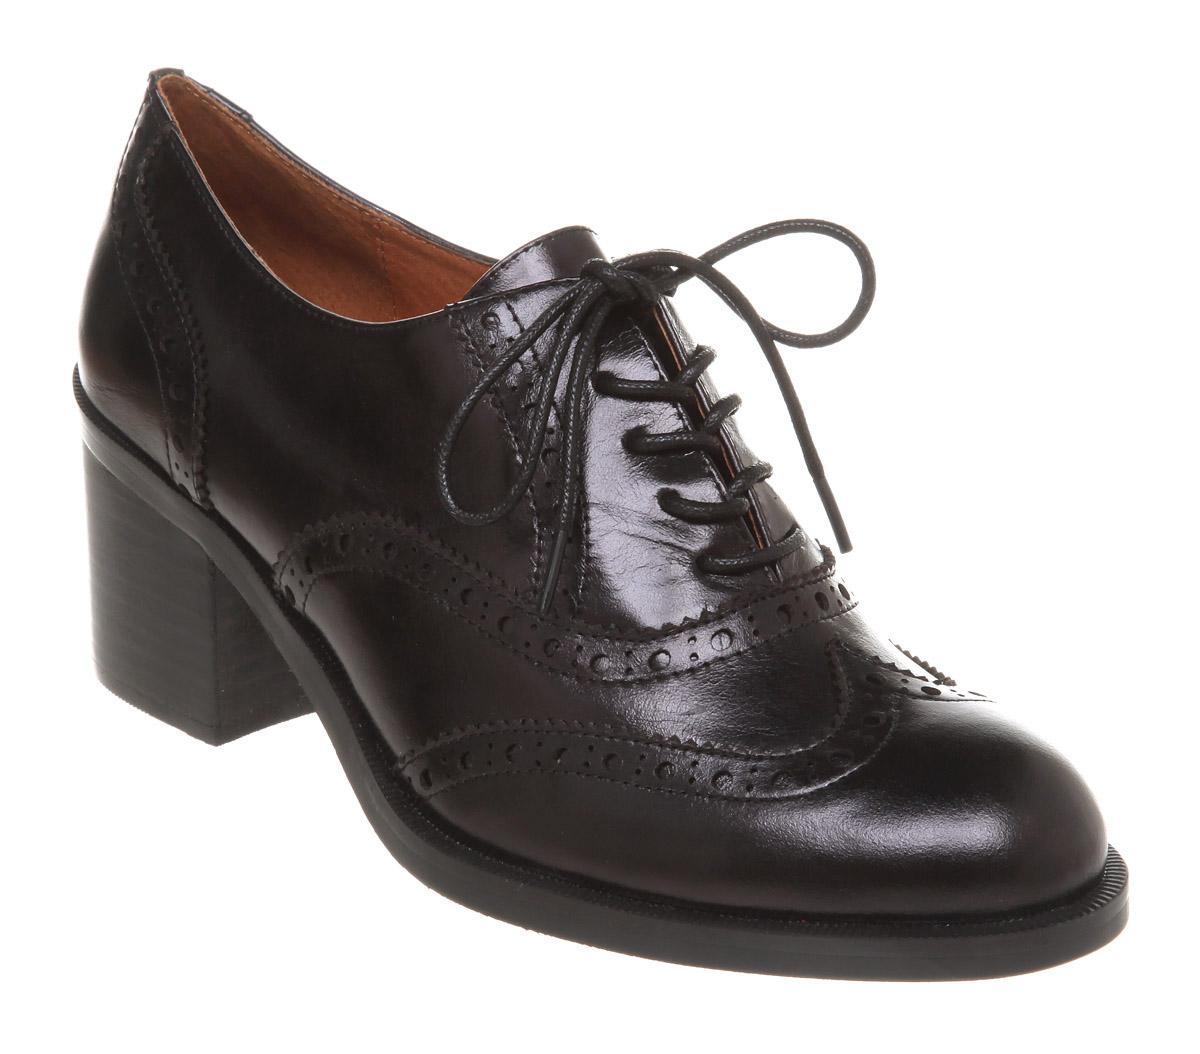 Women s Brogues Shoes Black